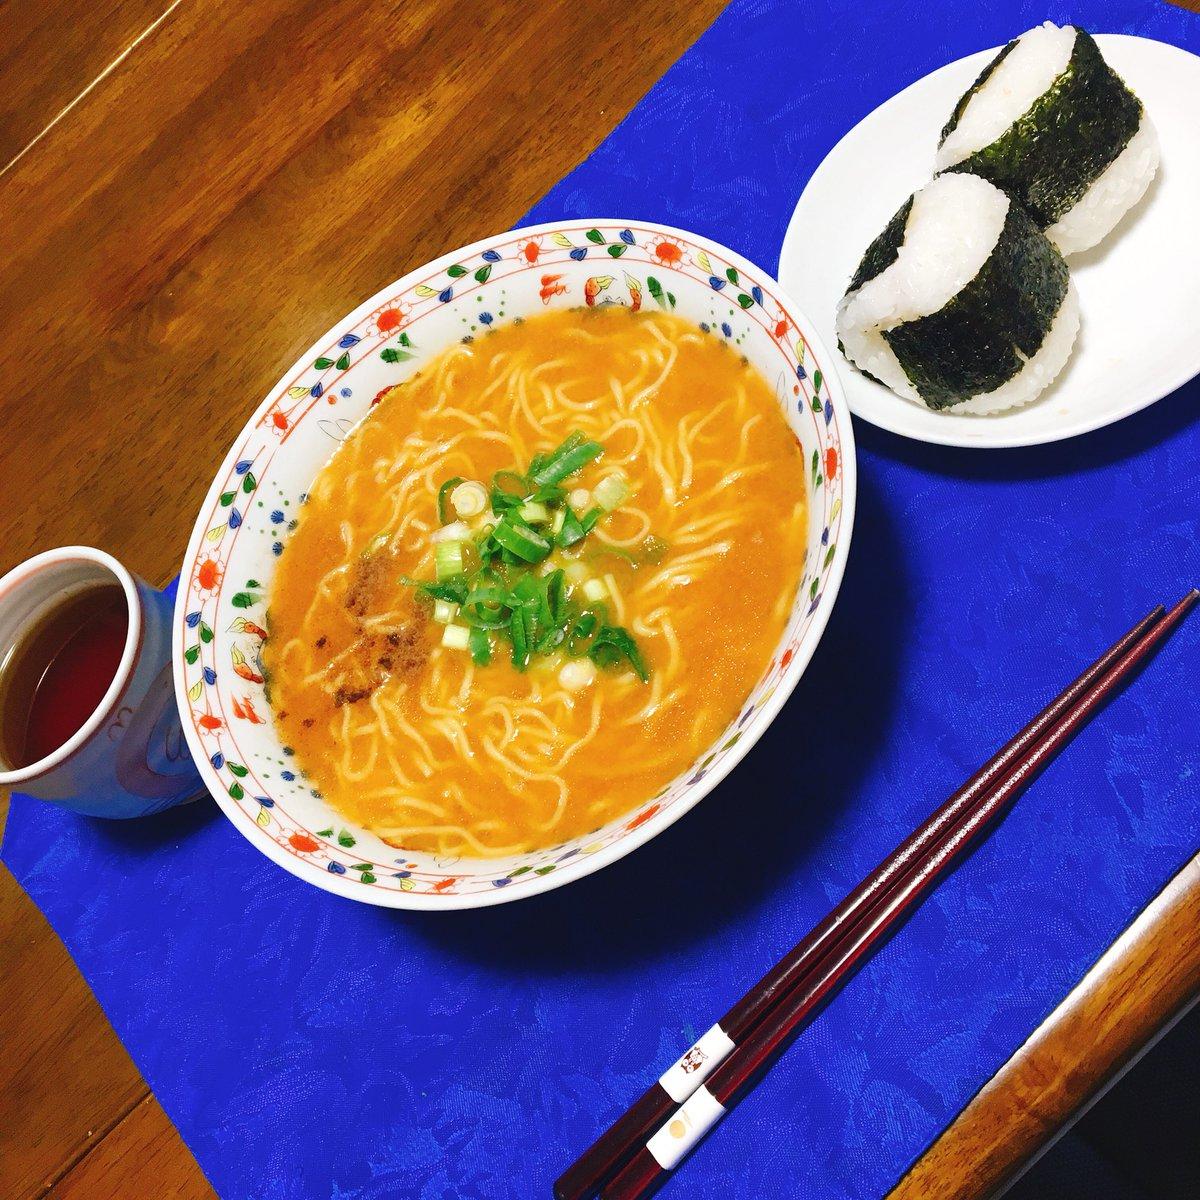 test ツイッターメディア - 賞味期限ギリギリ💦 ビギアゲの東方神起ラミョン食べました🍜 #東方神起 #BeginAgain https://t.co/bwVPeZDNCf